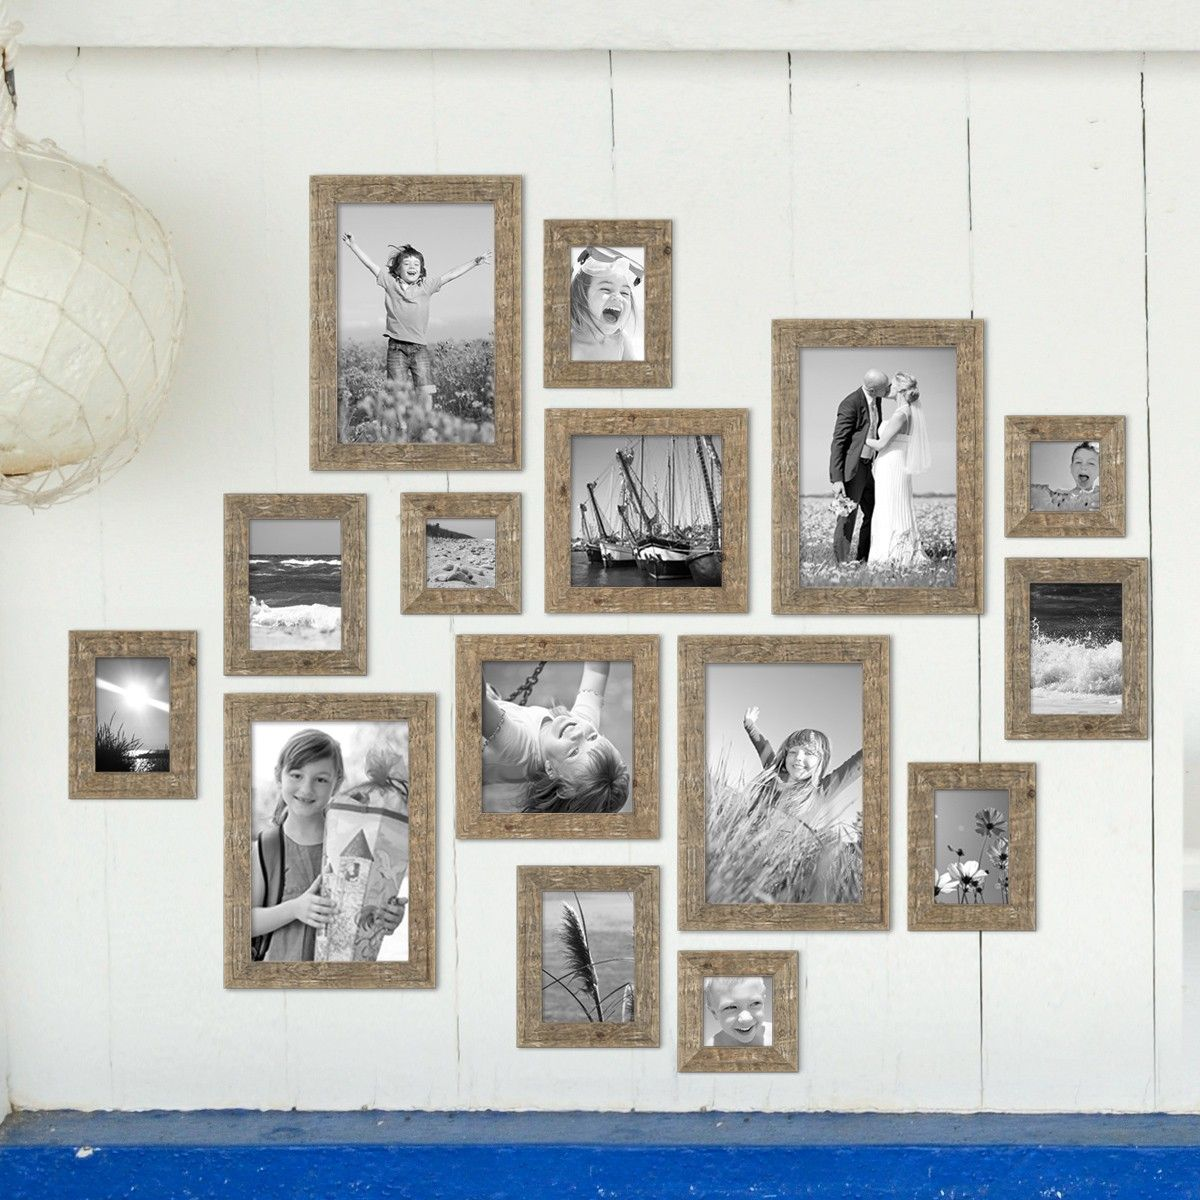 15er Bilderrahmen Set Strandhaus Rustikal Eiche Optik Natur Massivholz  10x10 Bis 20x30 Cm Inklusive